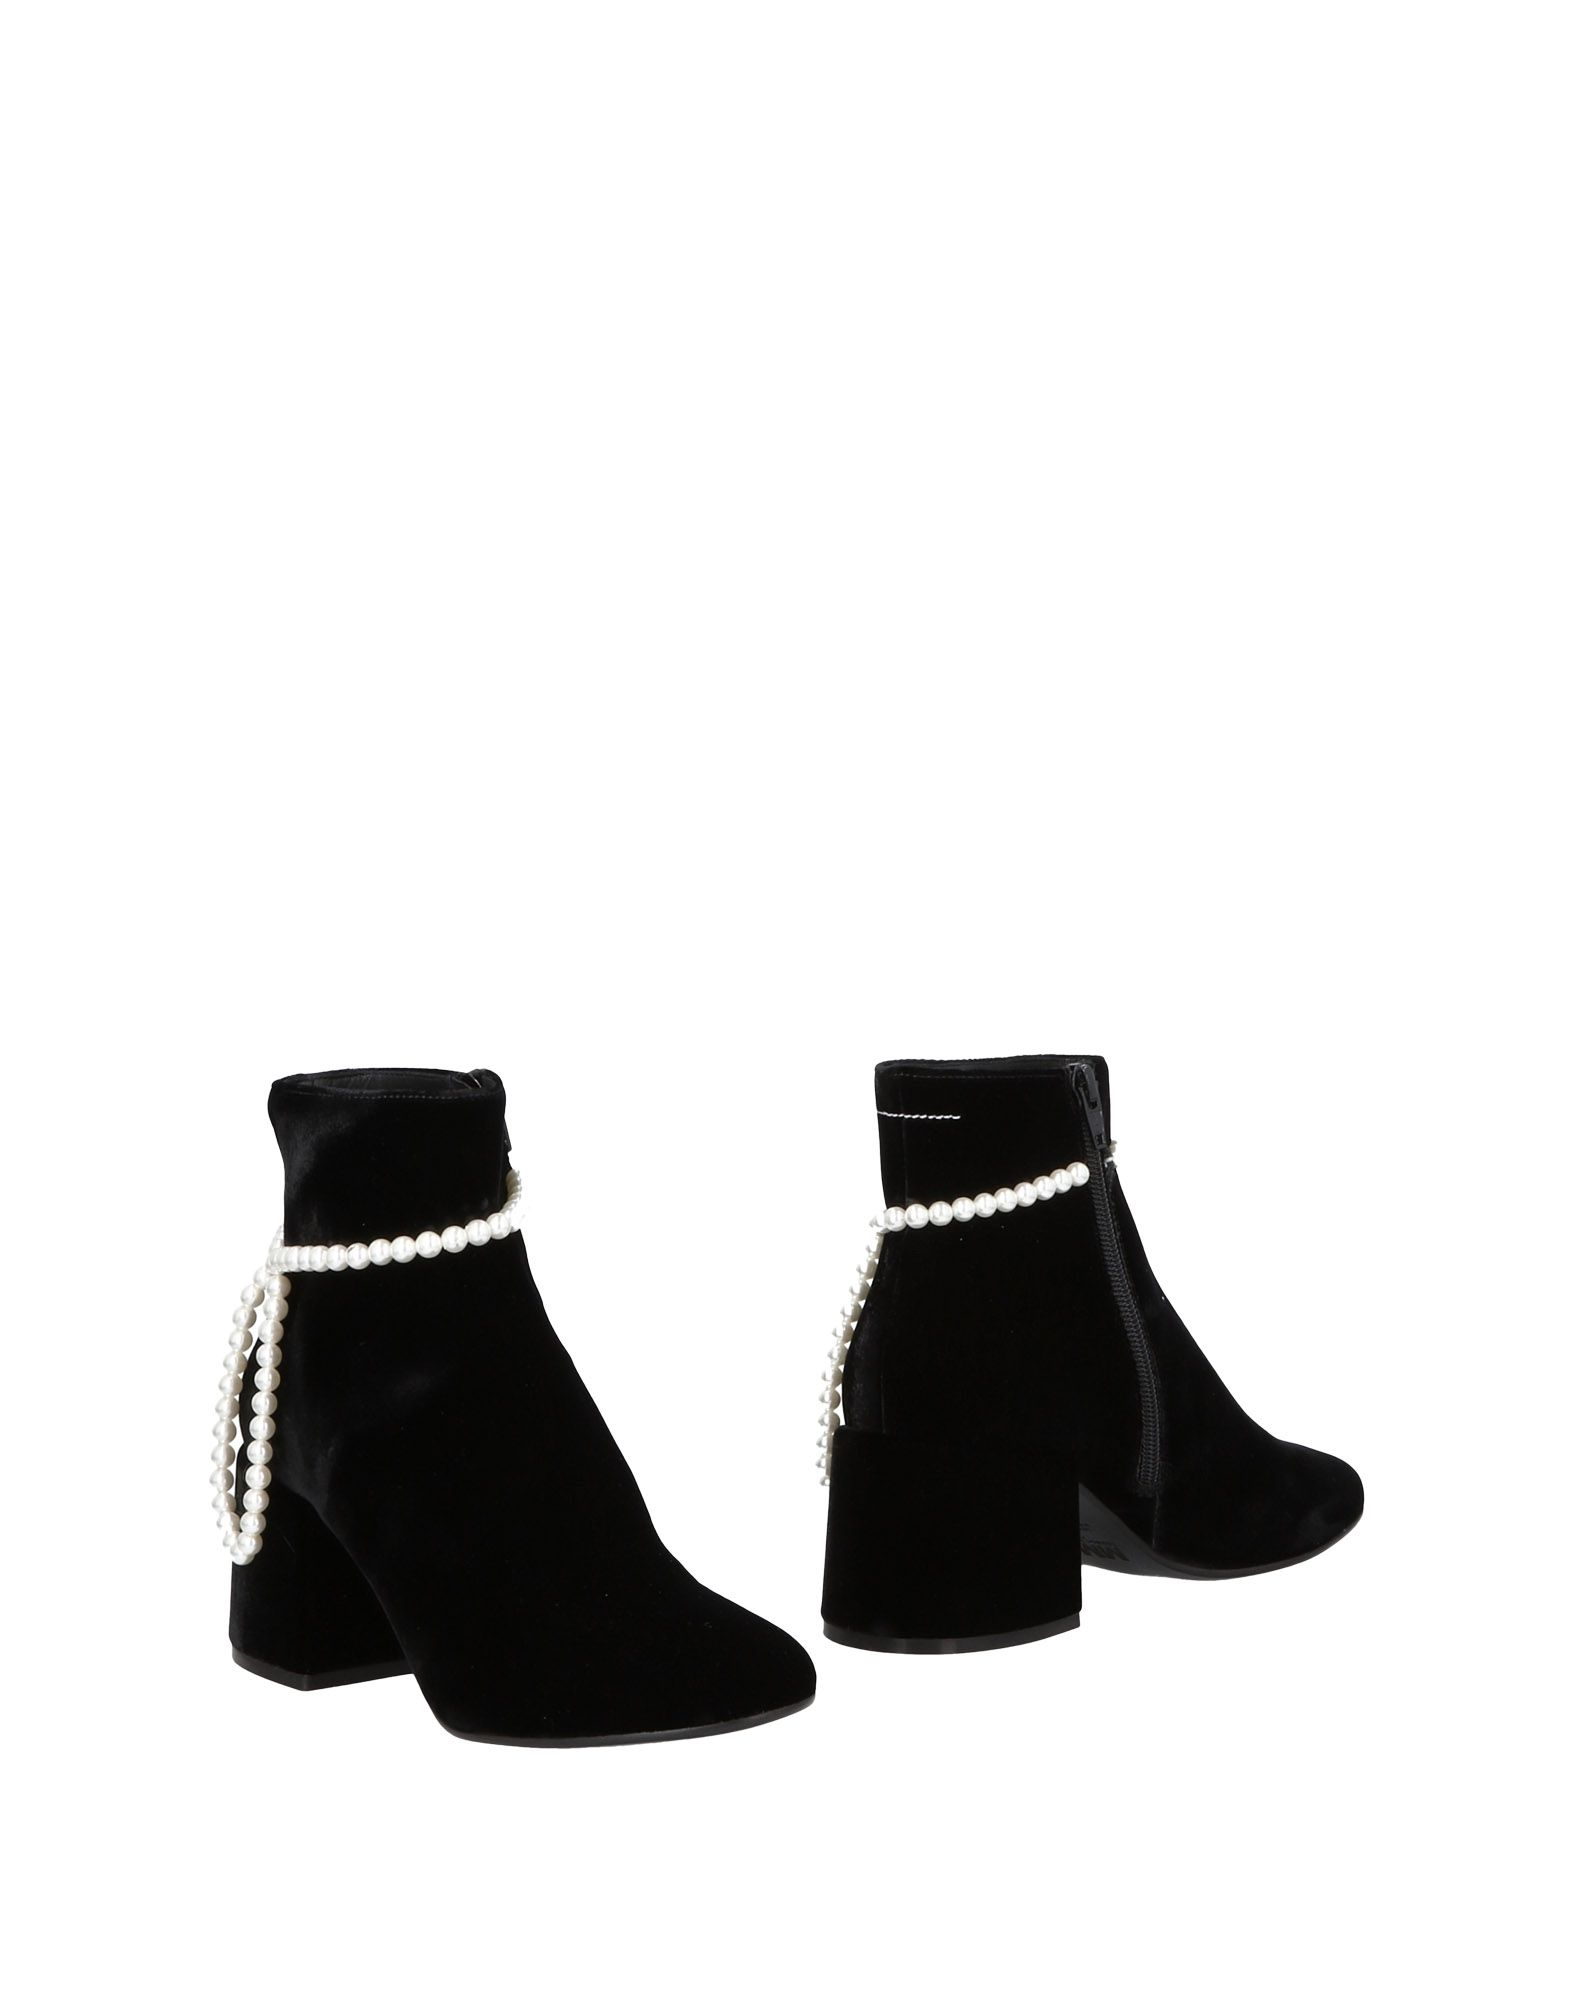 Mm6 Maison Margiela Stiefelette Damen  11469412EV Neue Schuhe